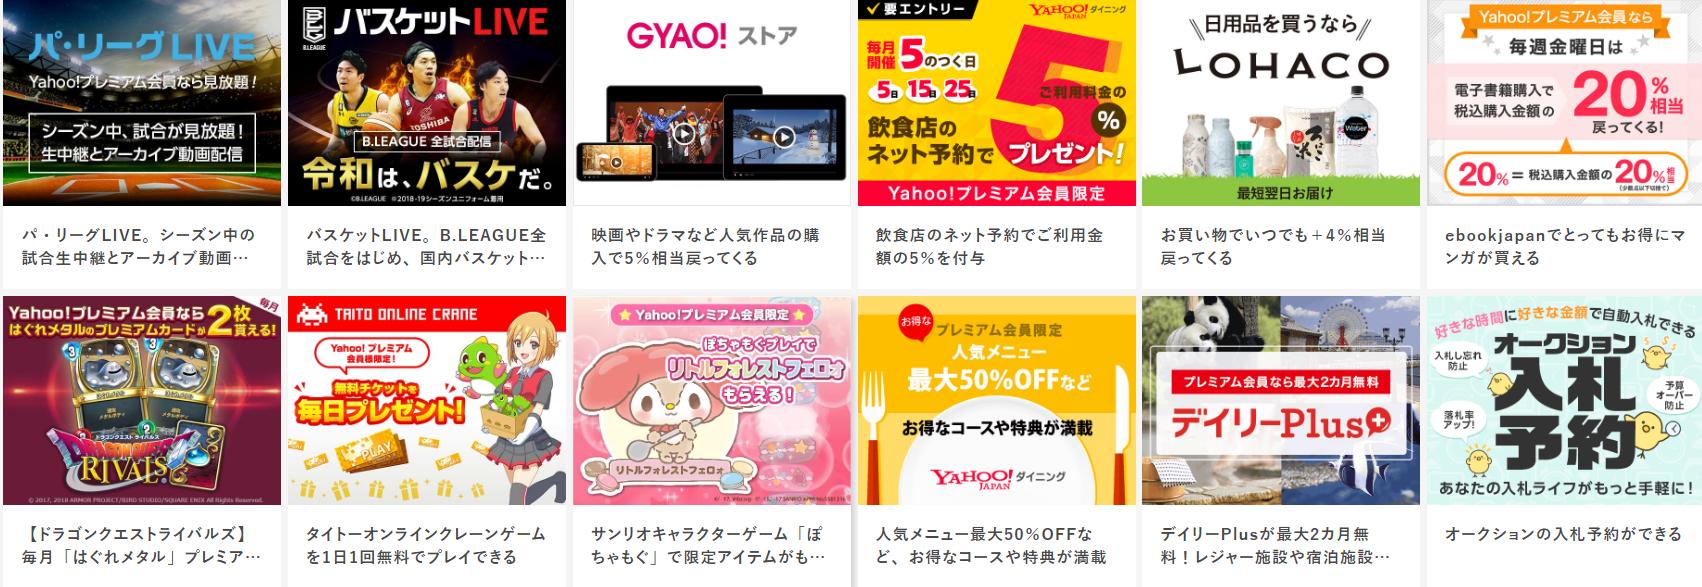 Yahoo!プレミアム会員特典②